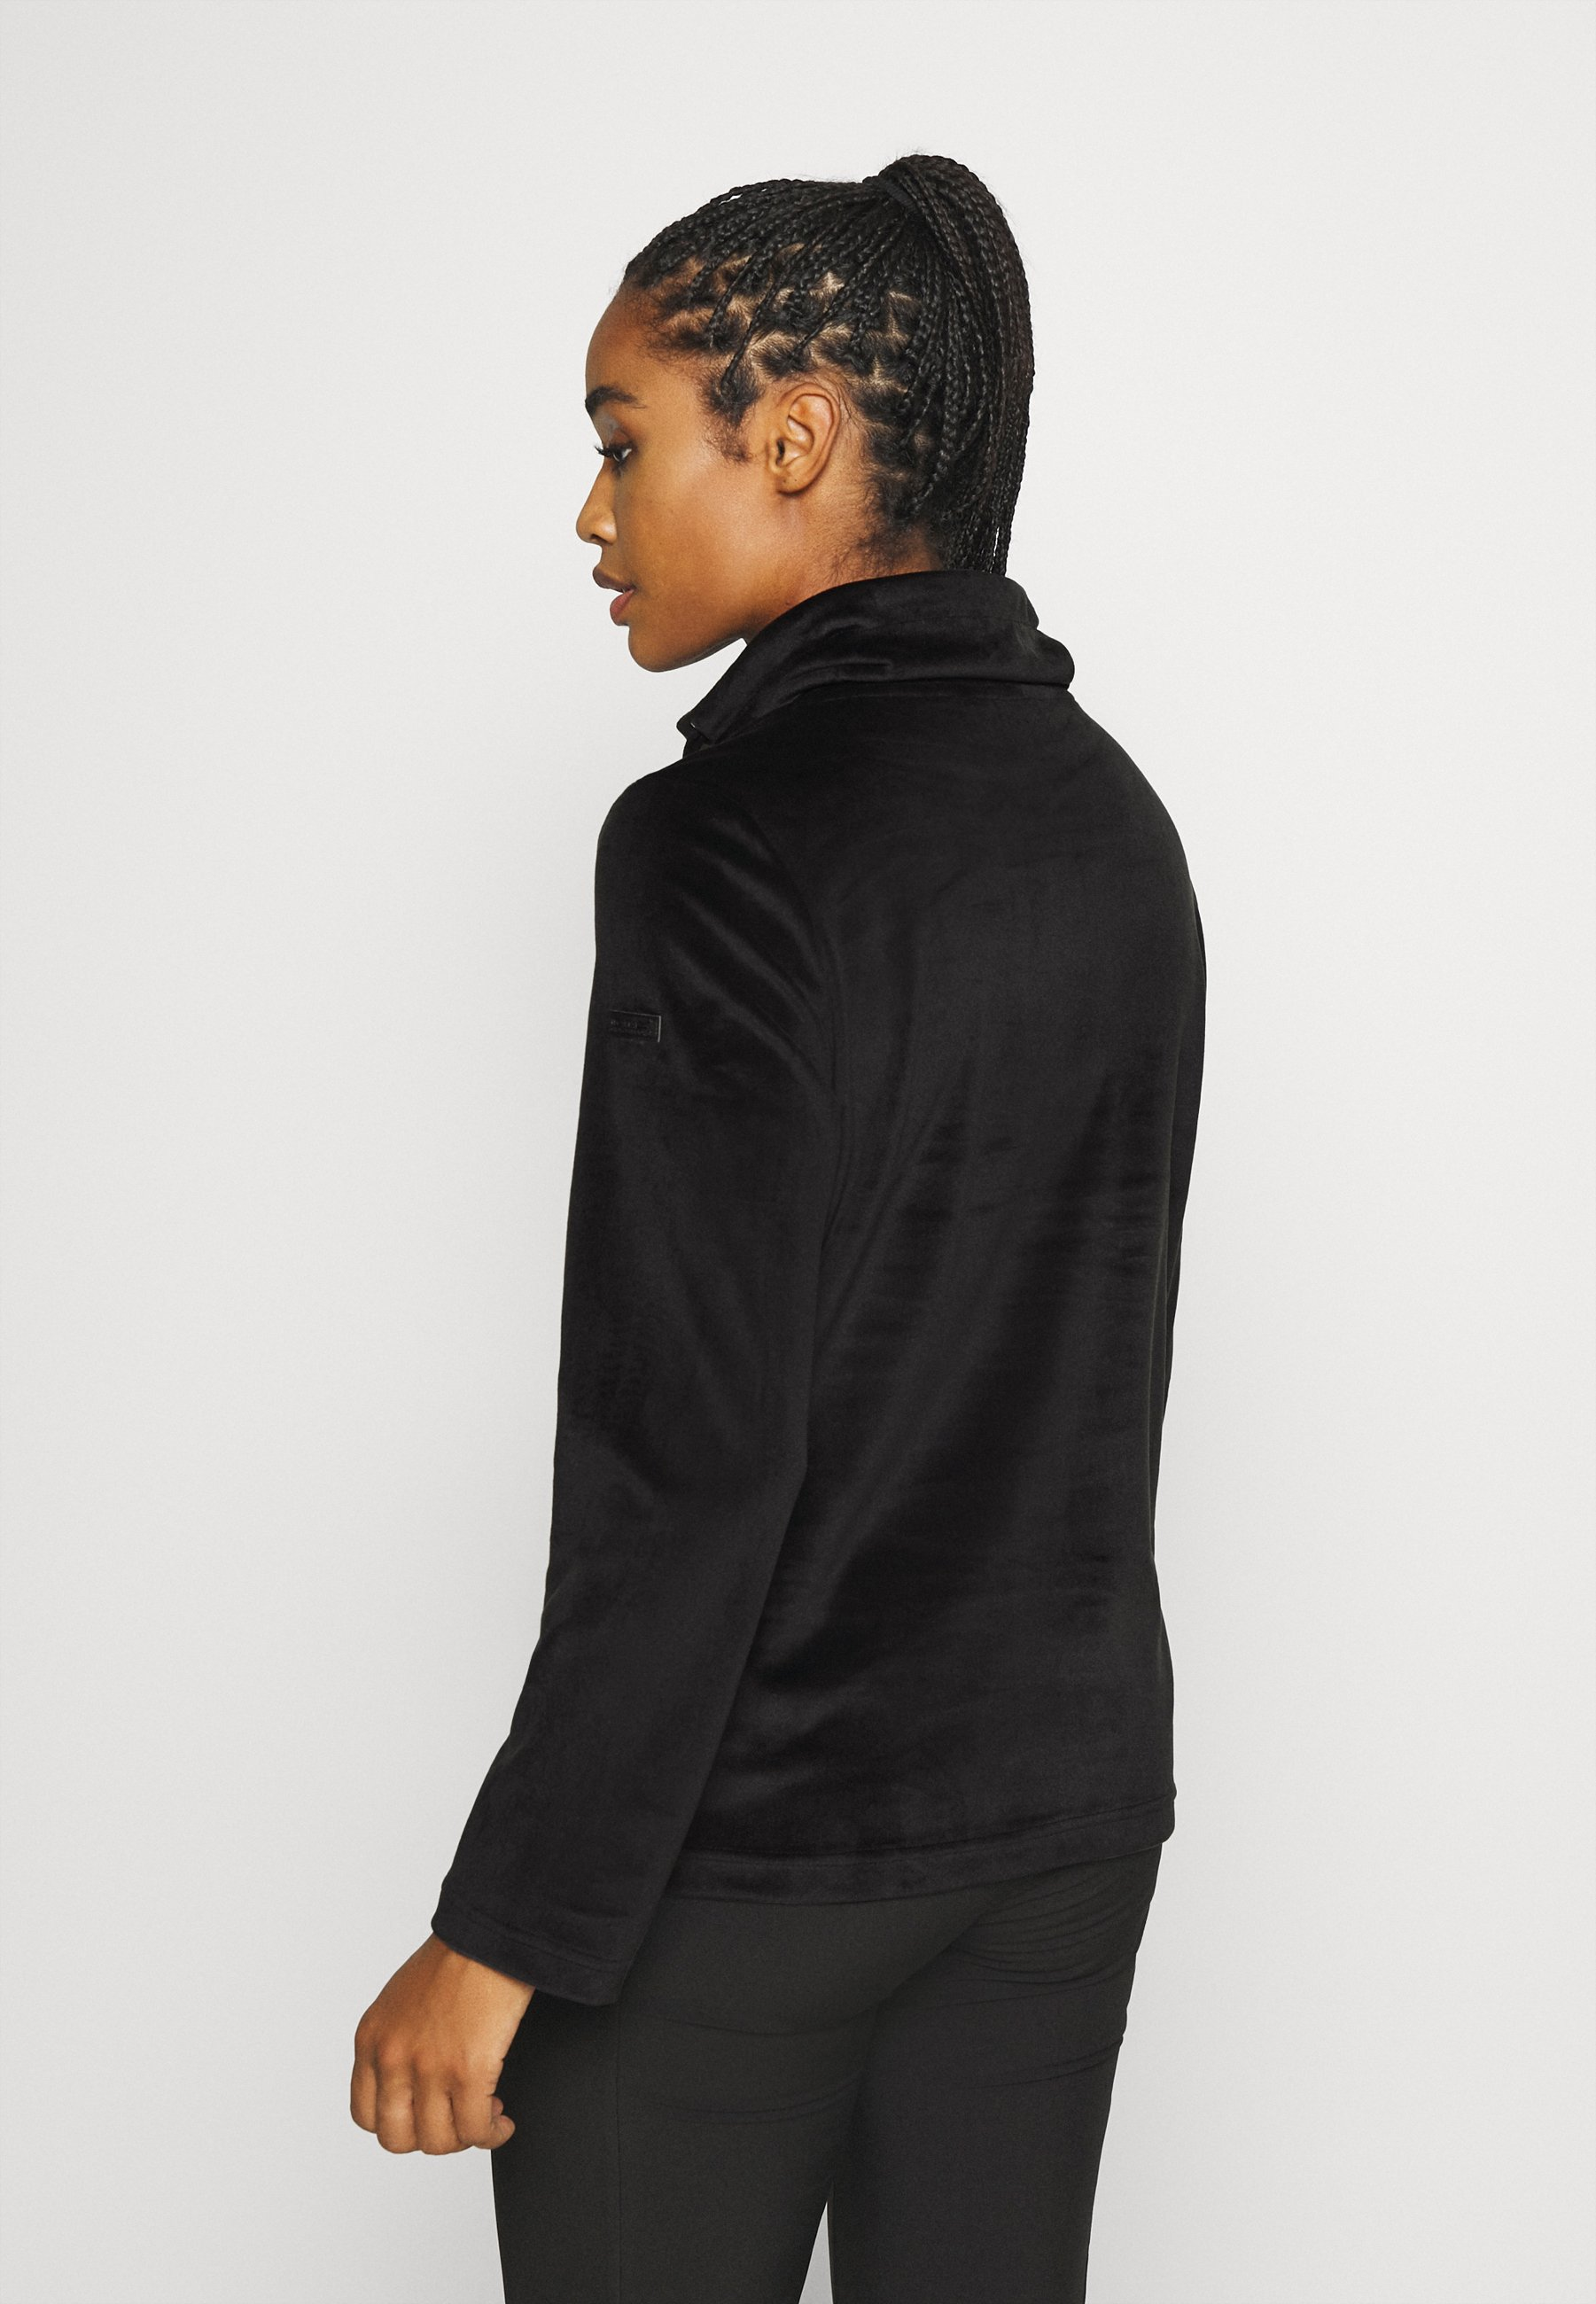 Regatta HANNELORE - Fleece jumper - black 098Xq